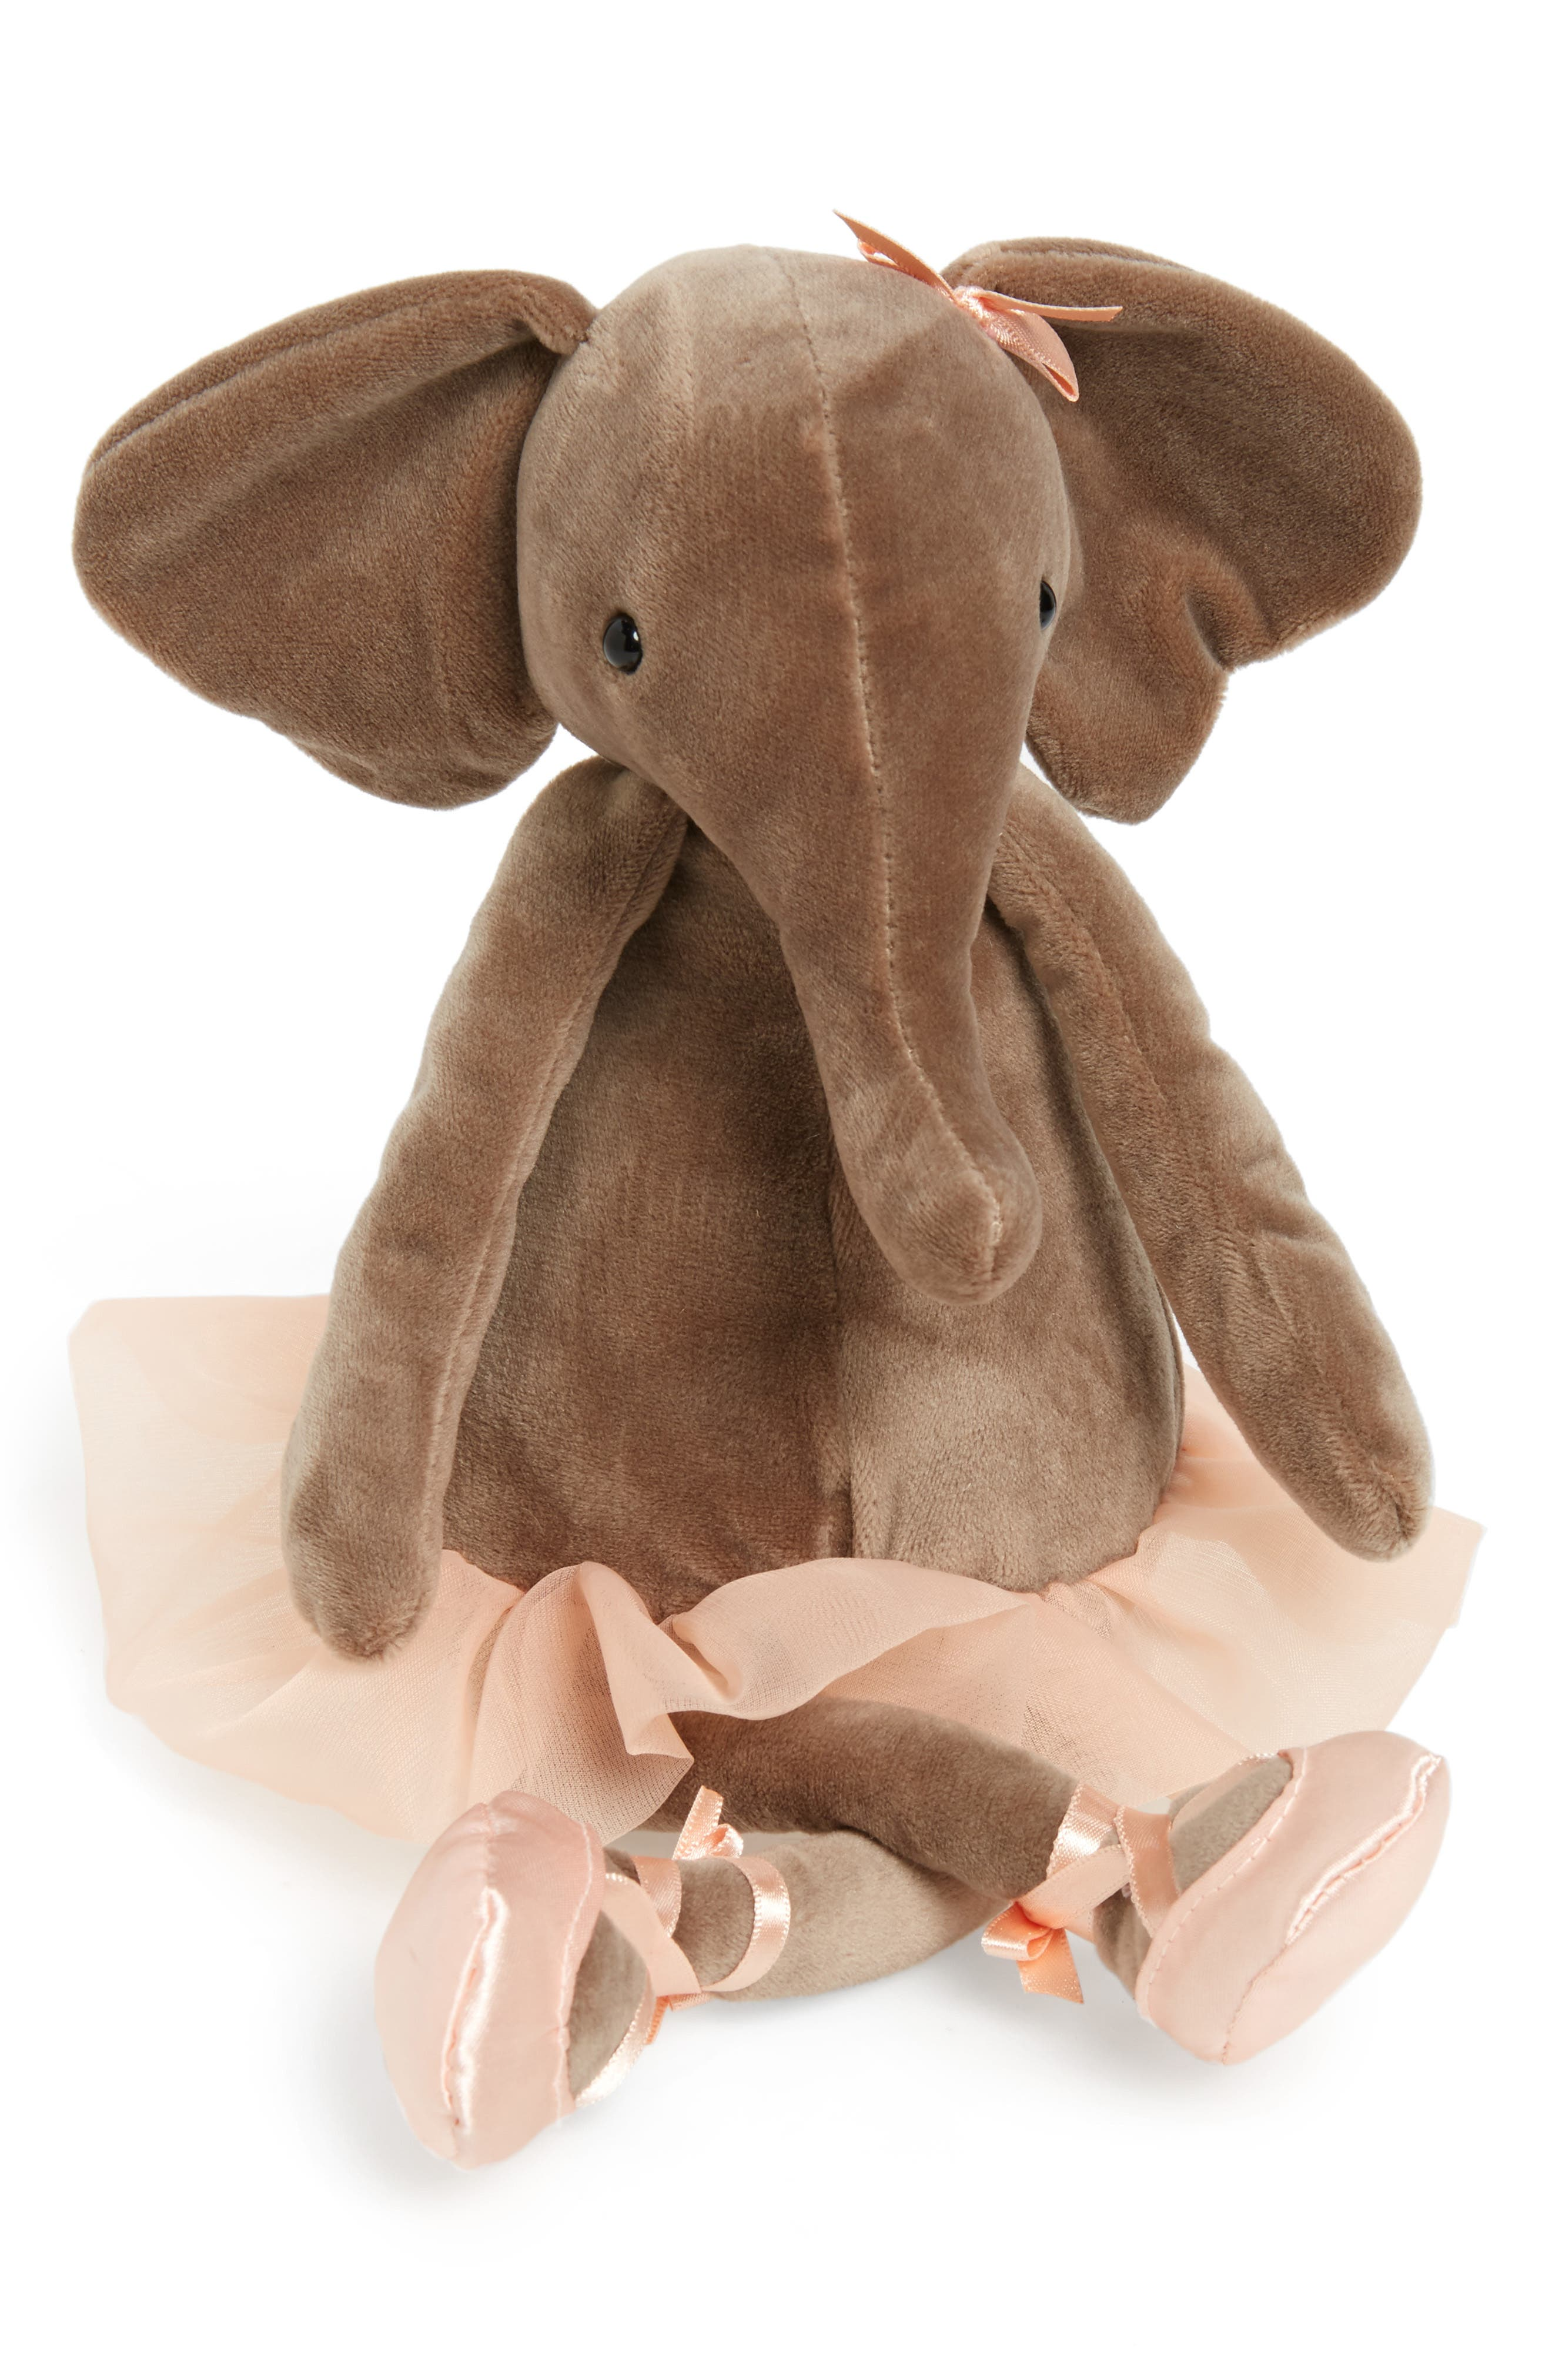 Jellycat Dancing Darcey - Elephant Stuffed Animal